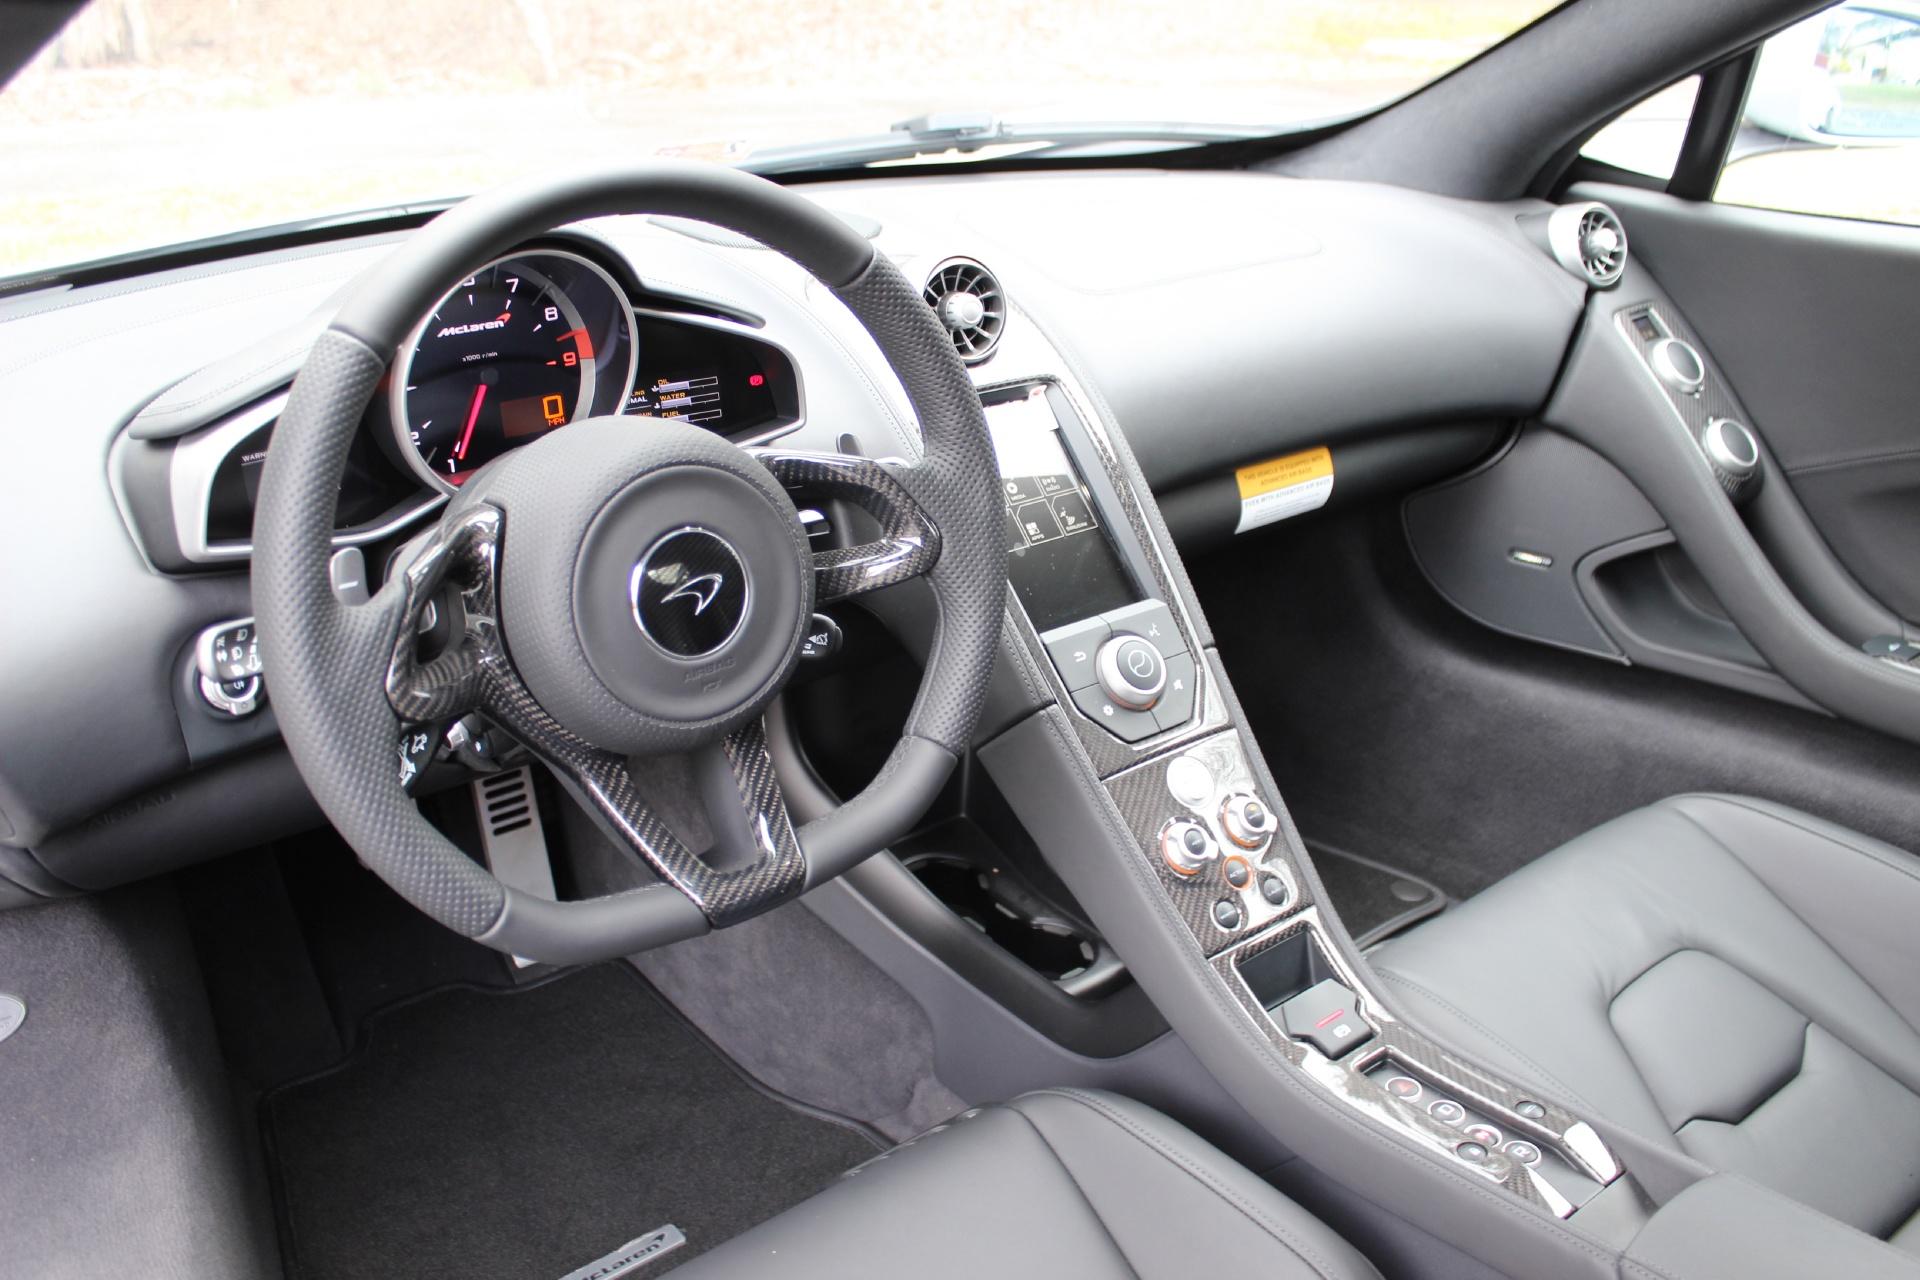 mclaren 650s interior. new 2016 mclaren 650s vienna va mclaren 650s interior